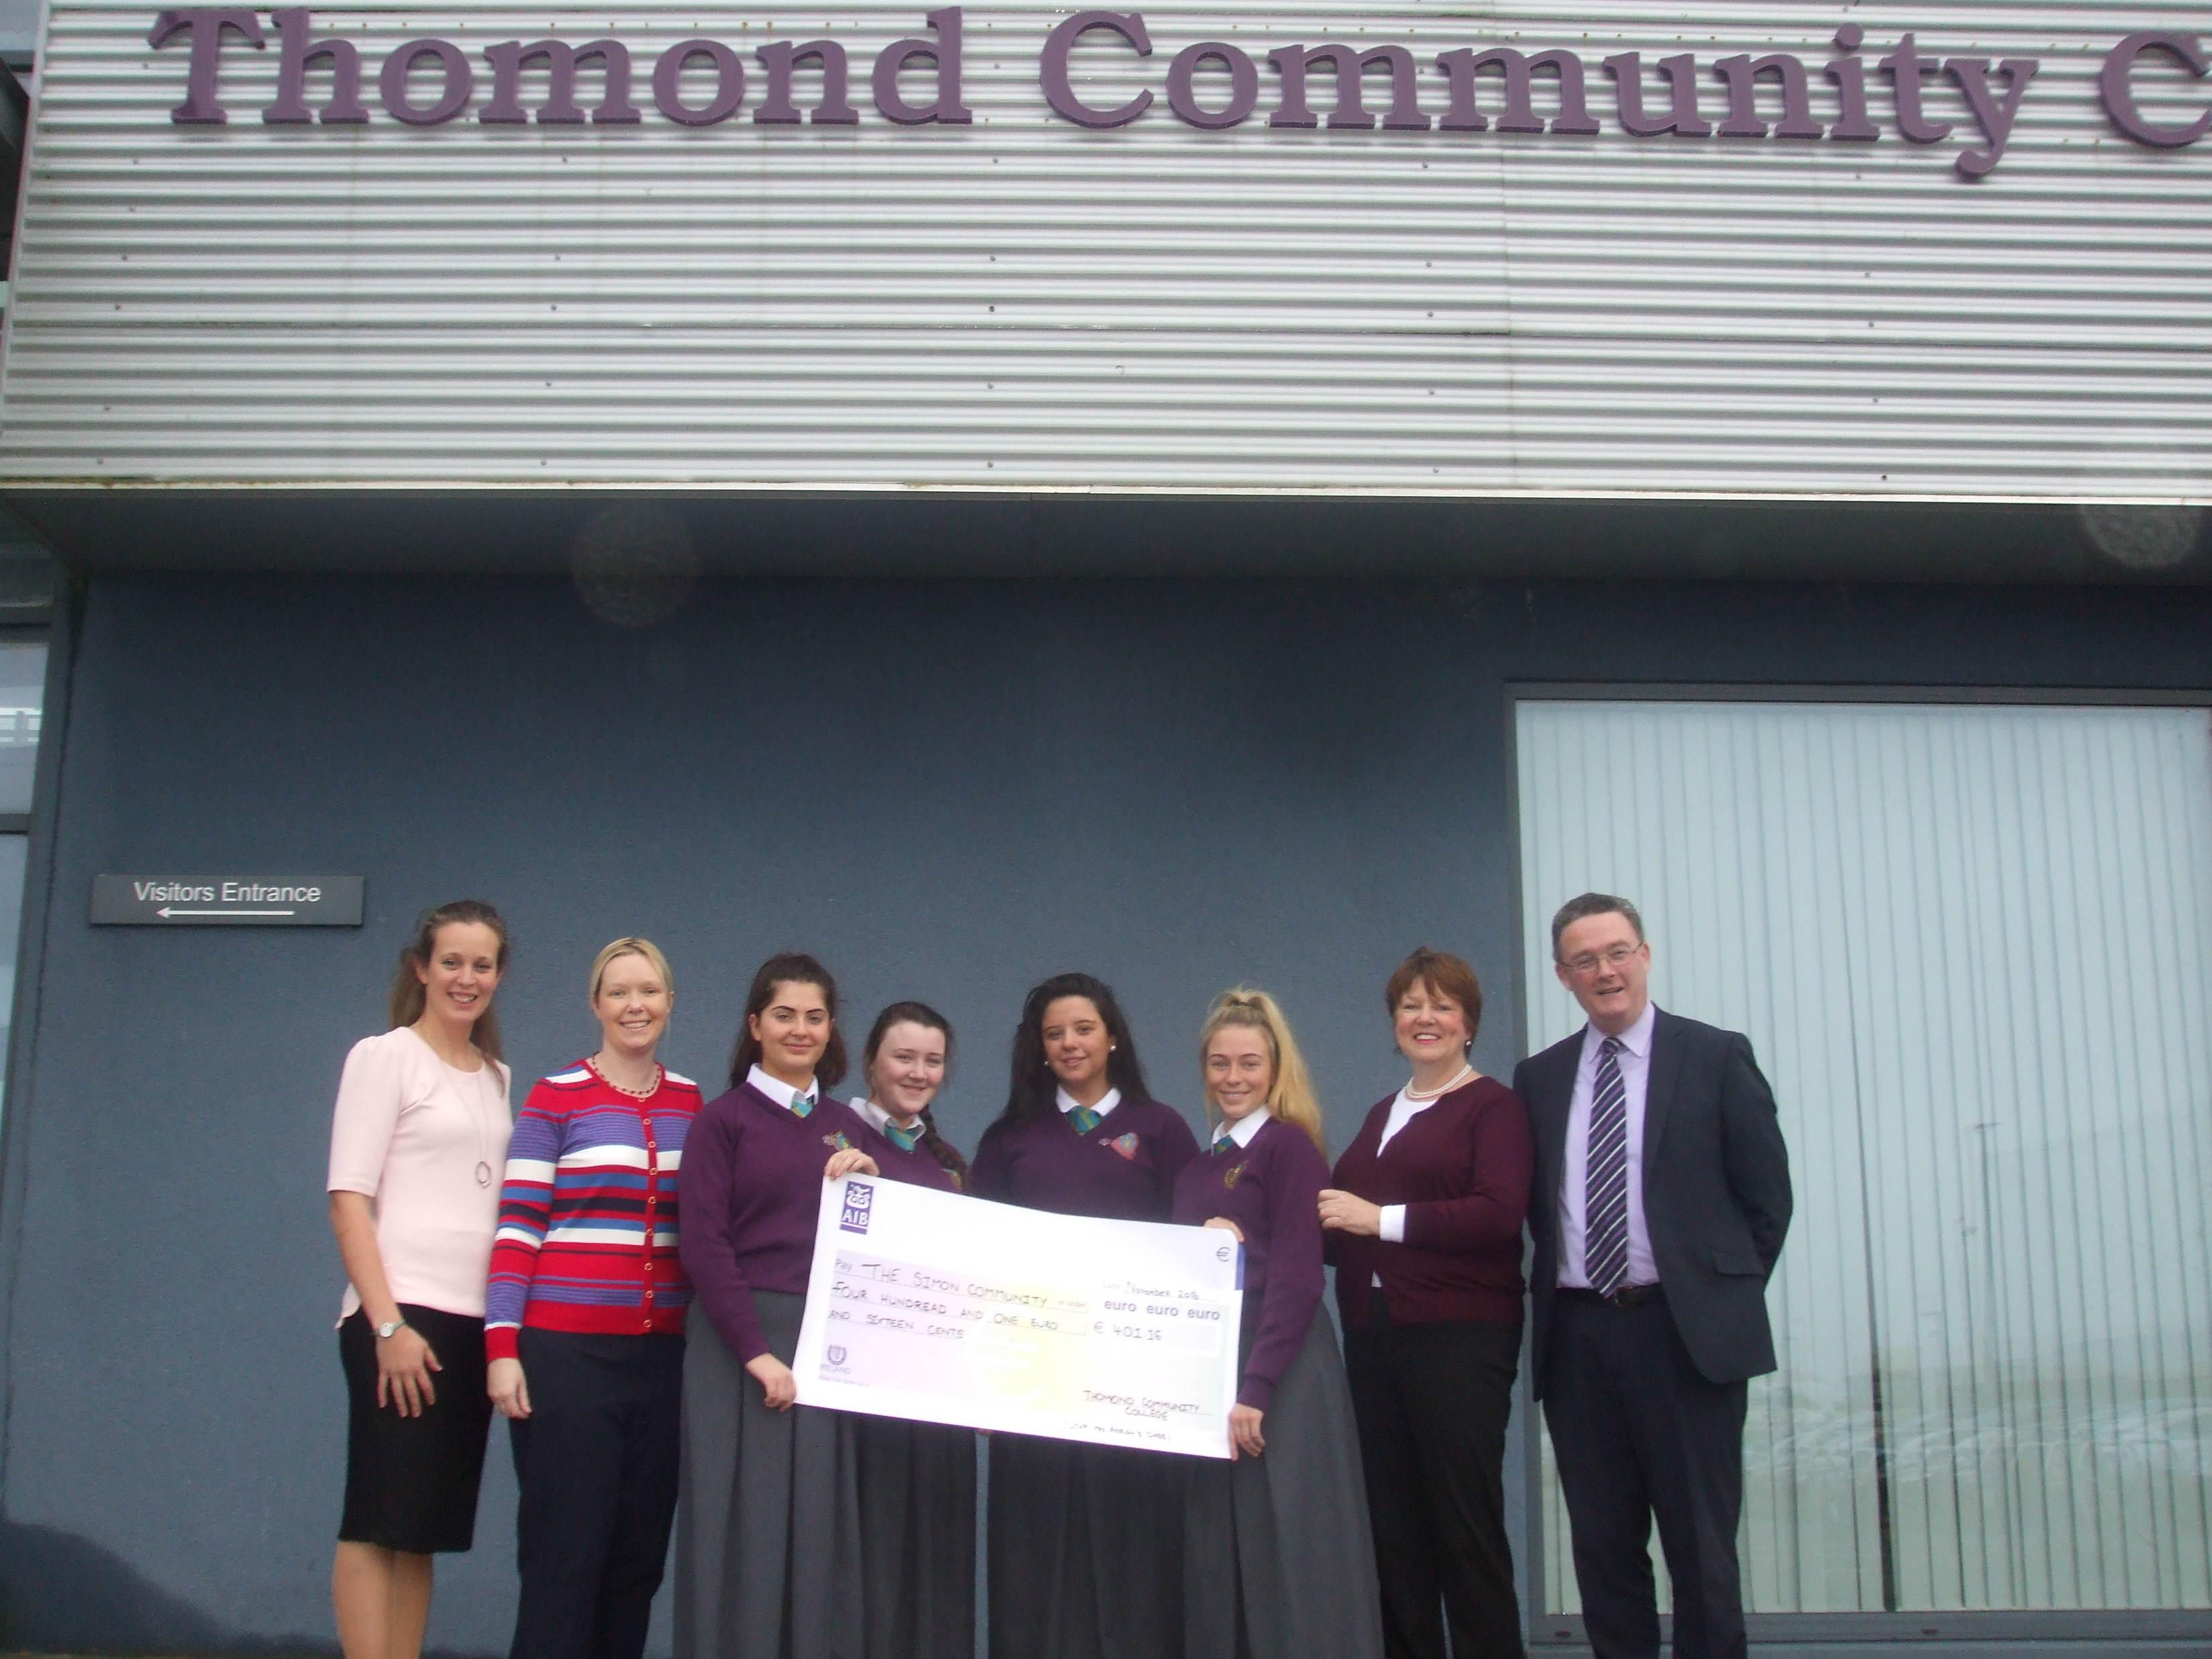 Thomond Community College raise funds